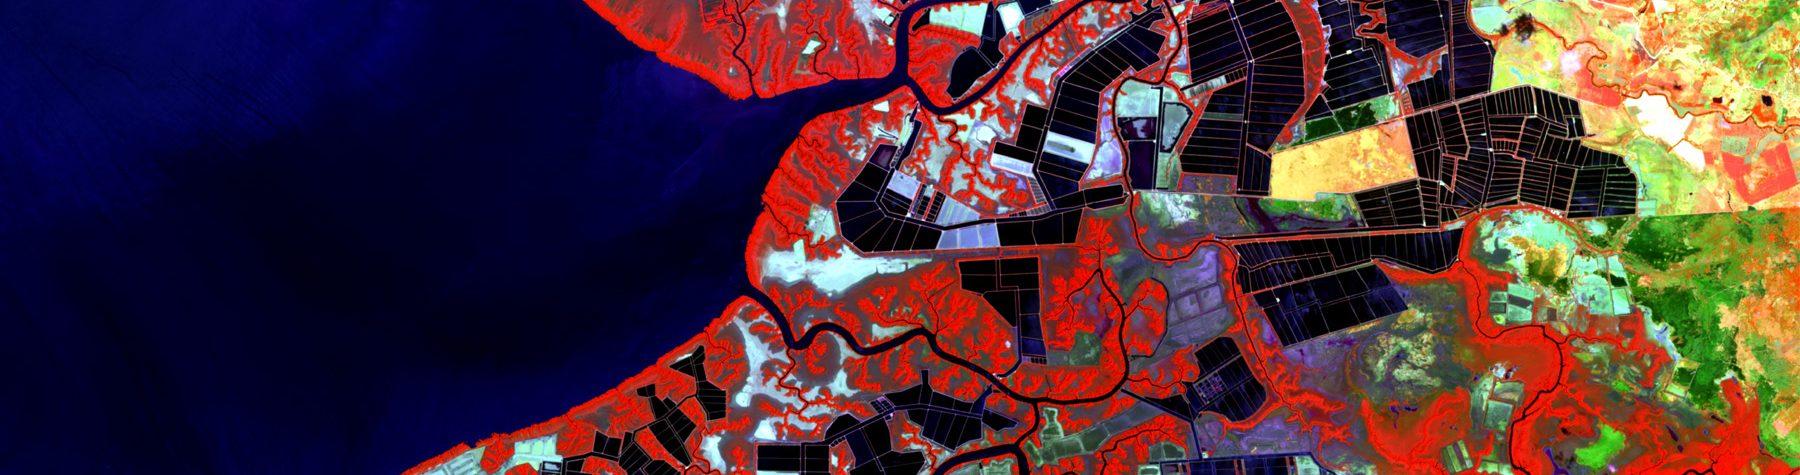 Geospatial Data Analytics Online Graduate Certificate: Satellite Imagery of Shrimp Farming Beds in Nicaragua.